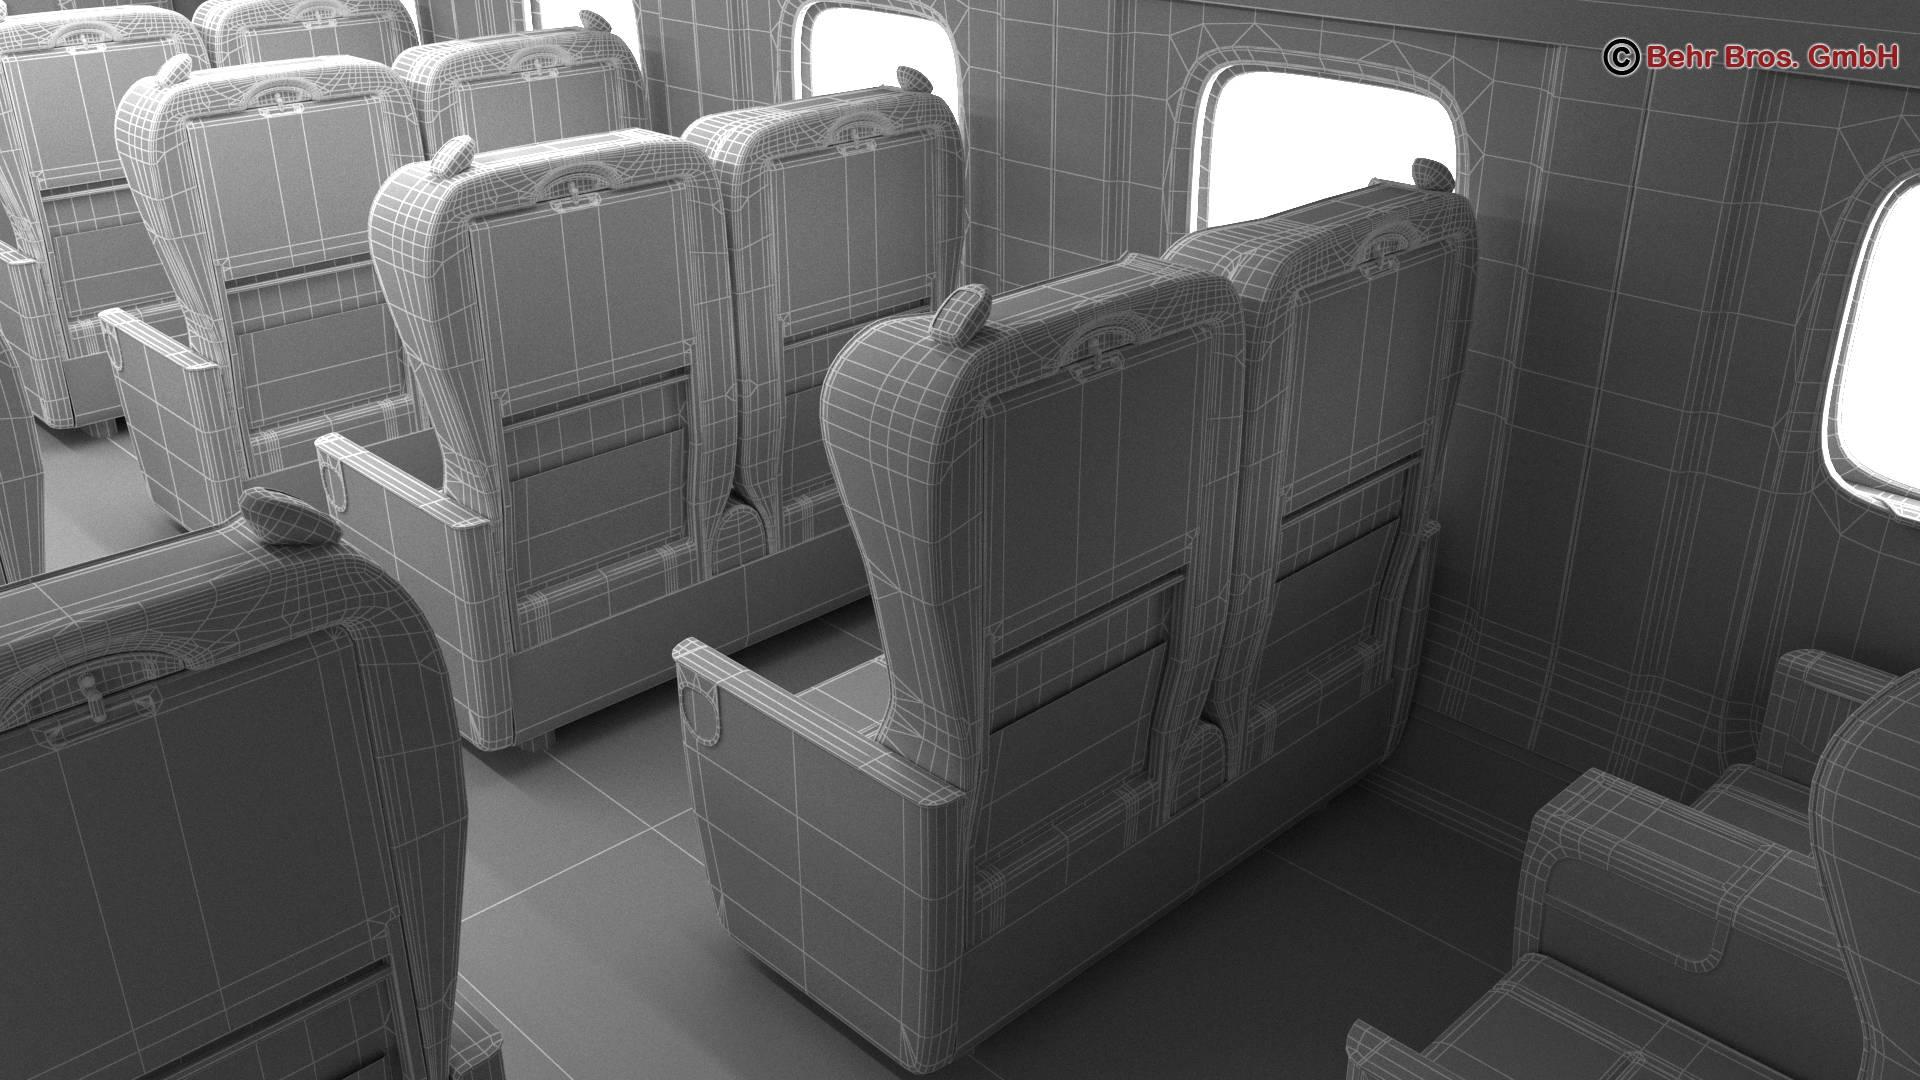 shinkansen e7 3d model 3ds max fbx c4d lwo ma mb obj 265684